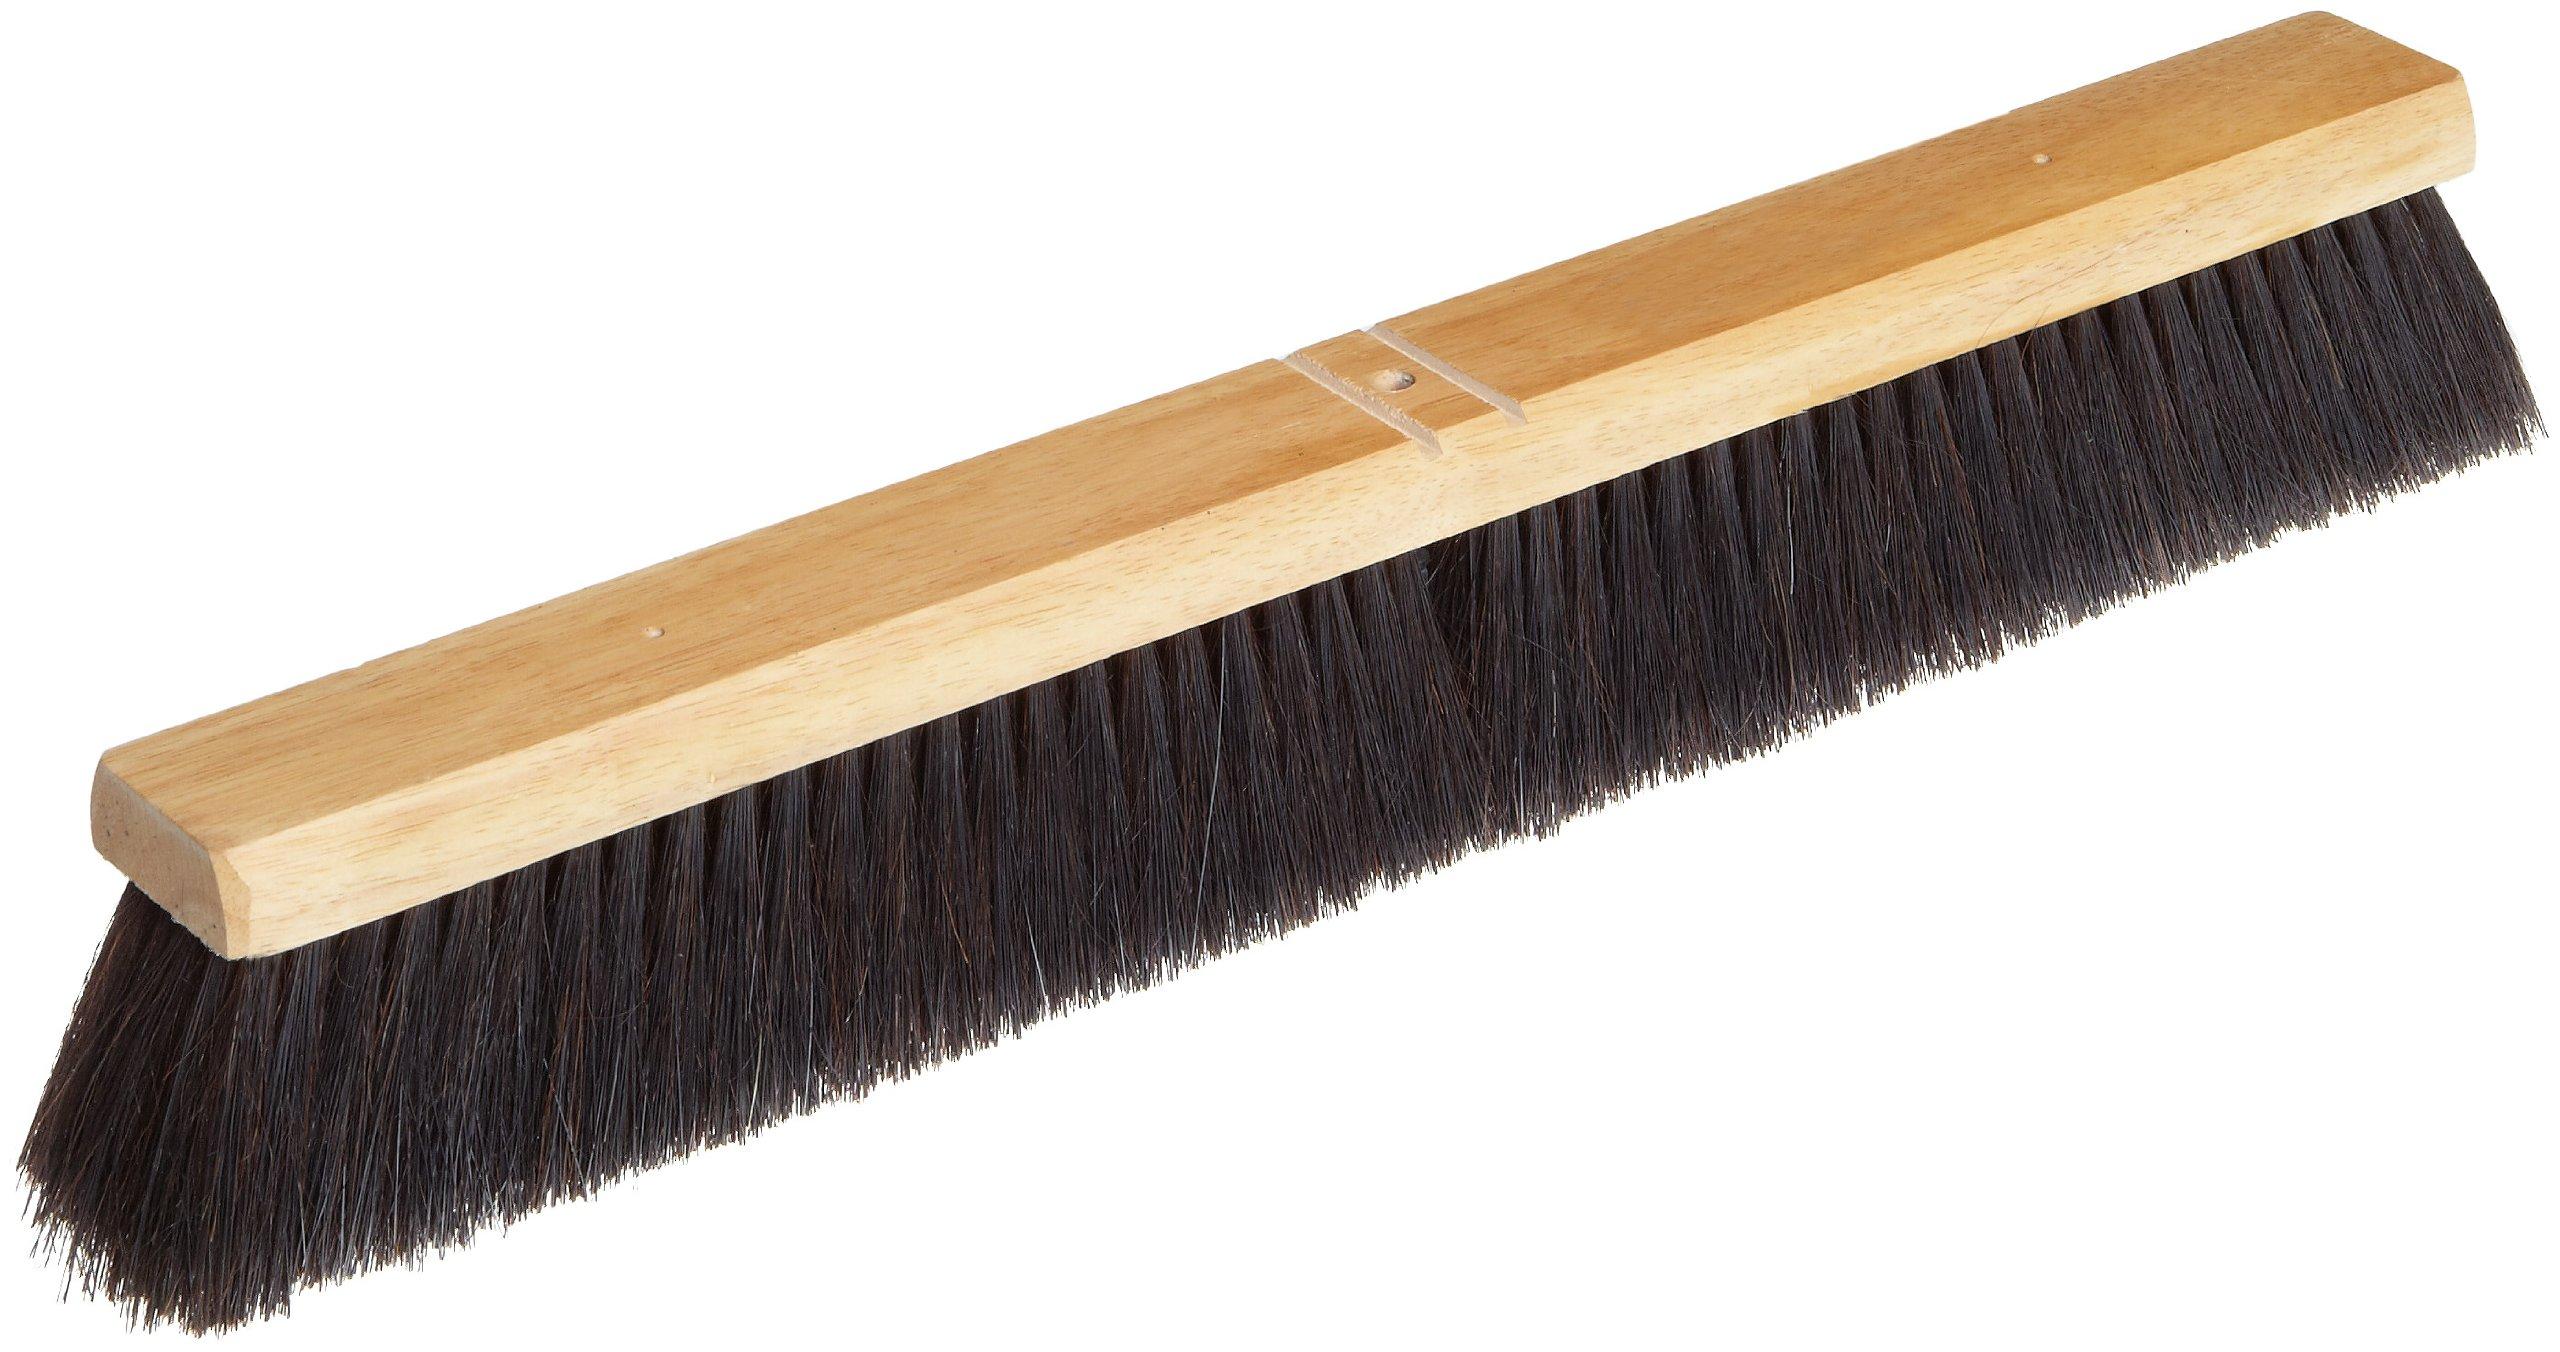 No. 17A Line Floor/Garage Brushes - 24'' floor brush req.d60340d2b steel wire/